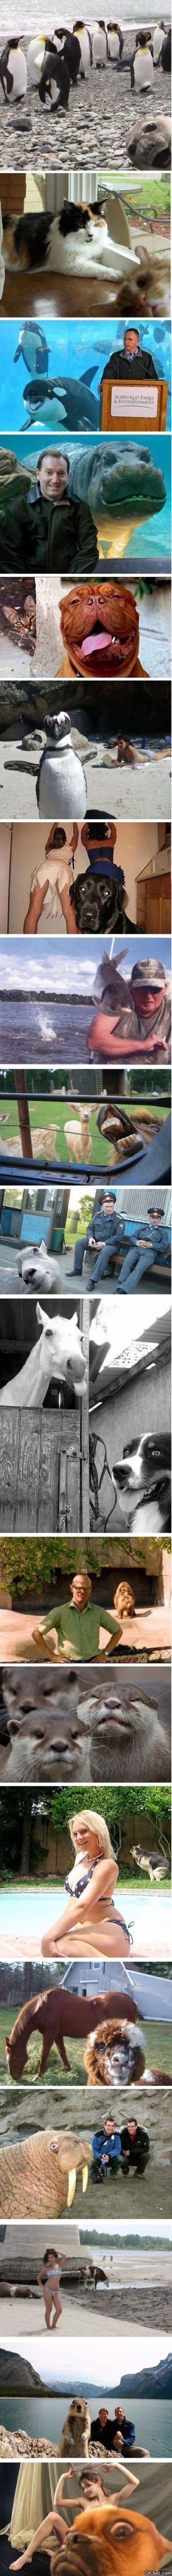 photobombing-animals